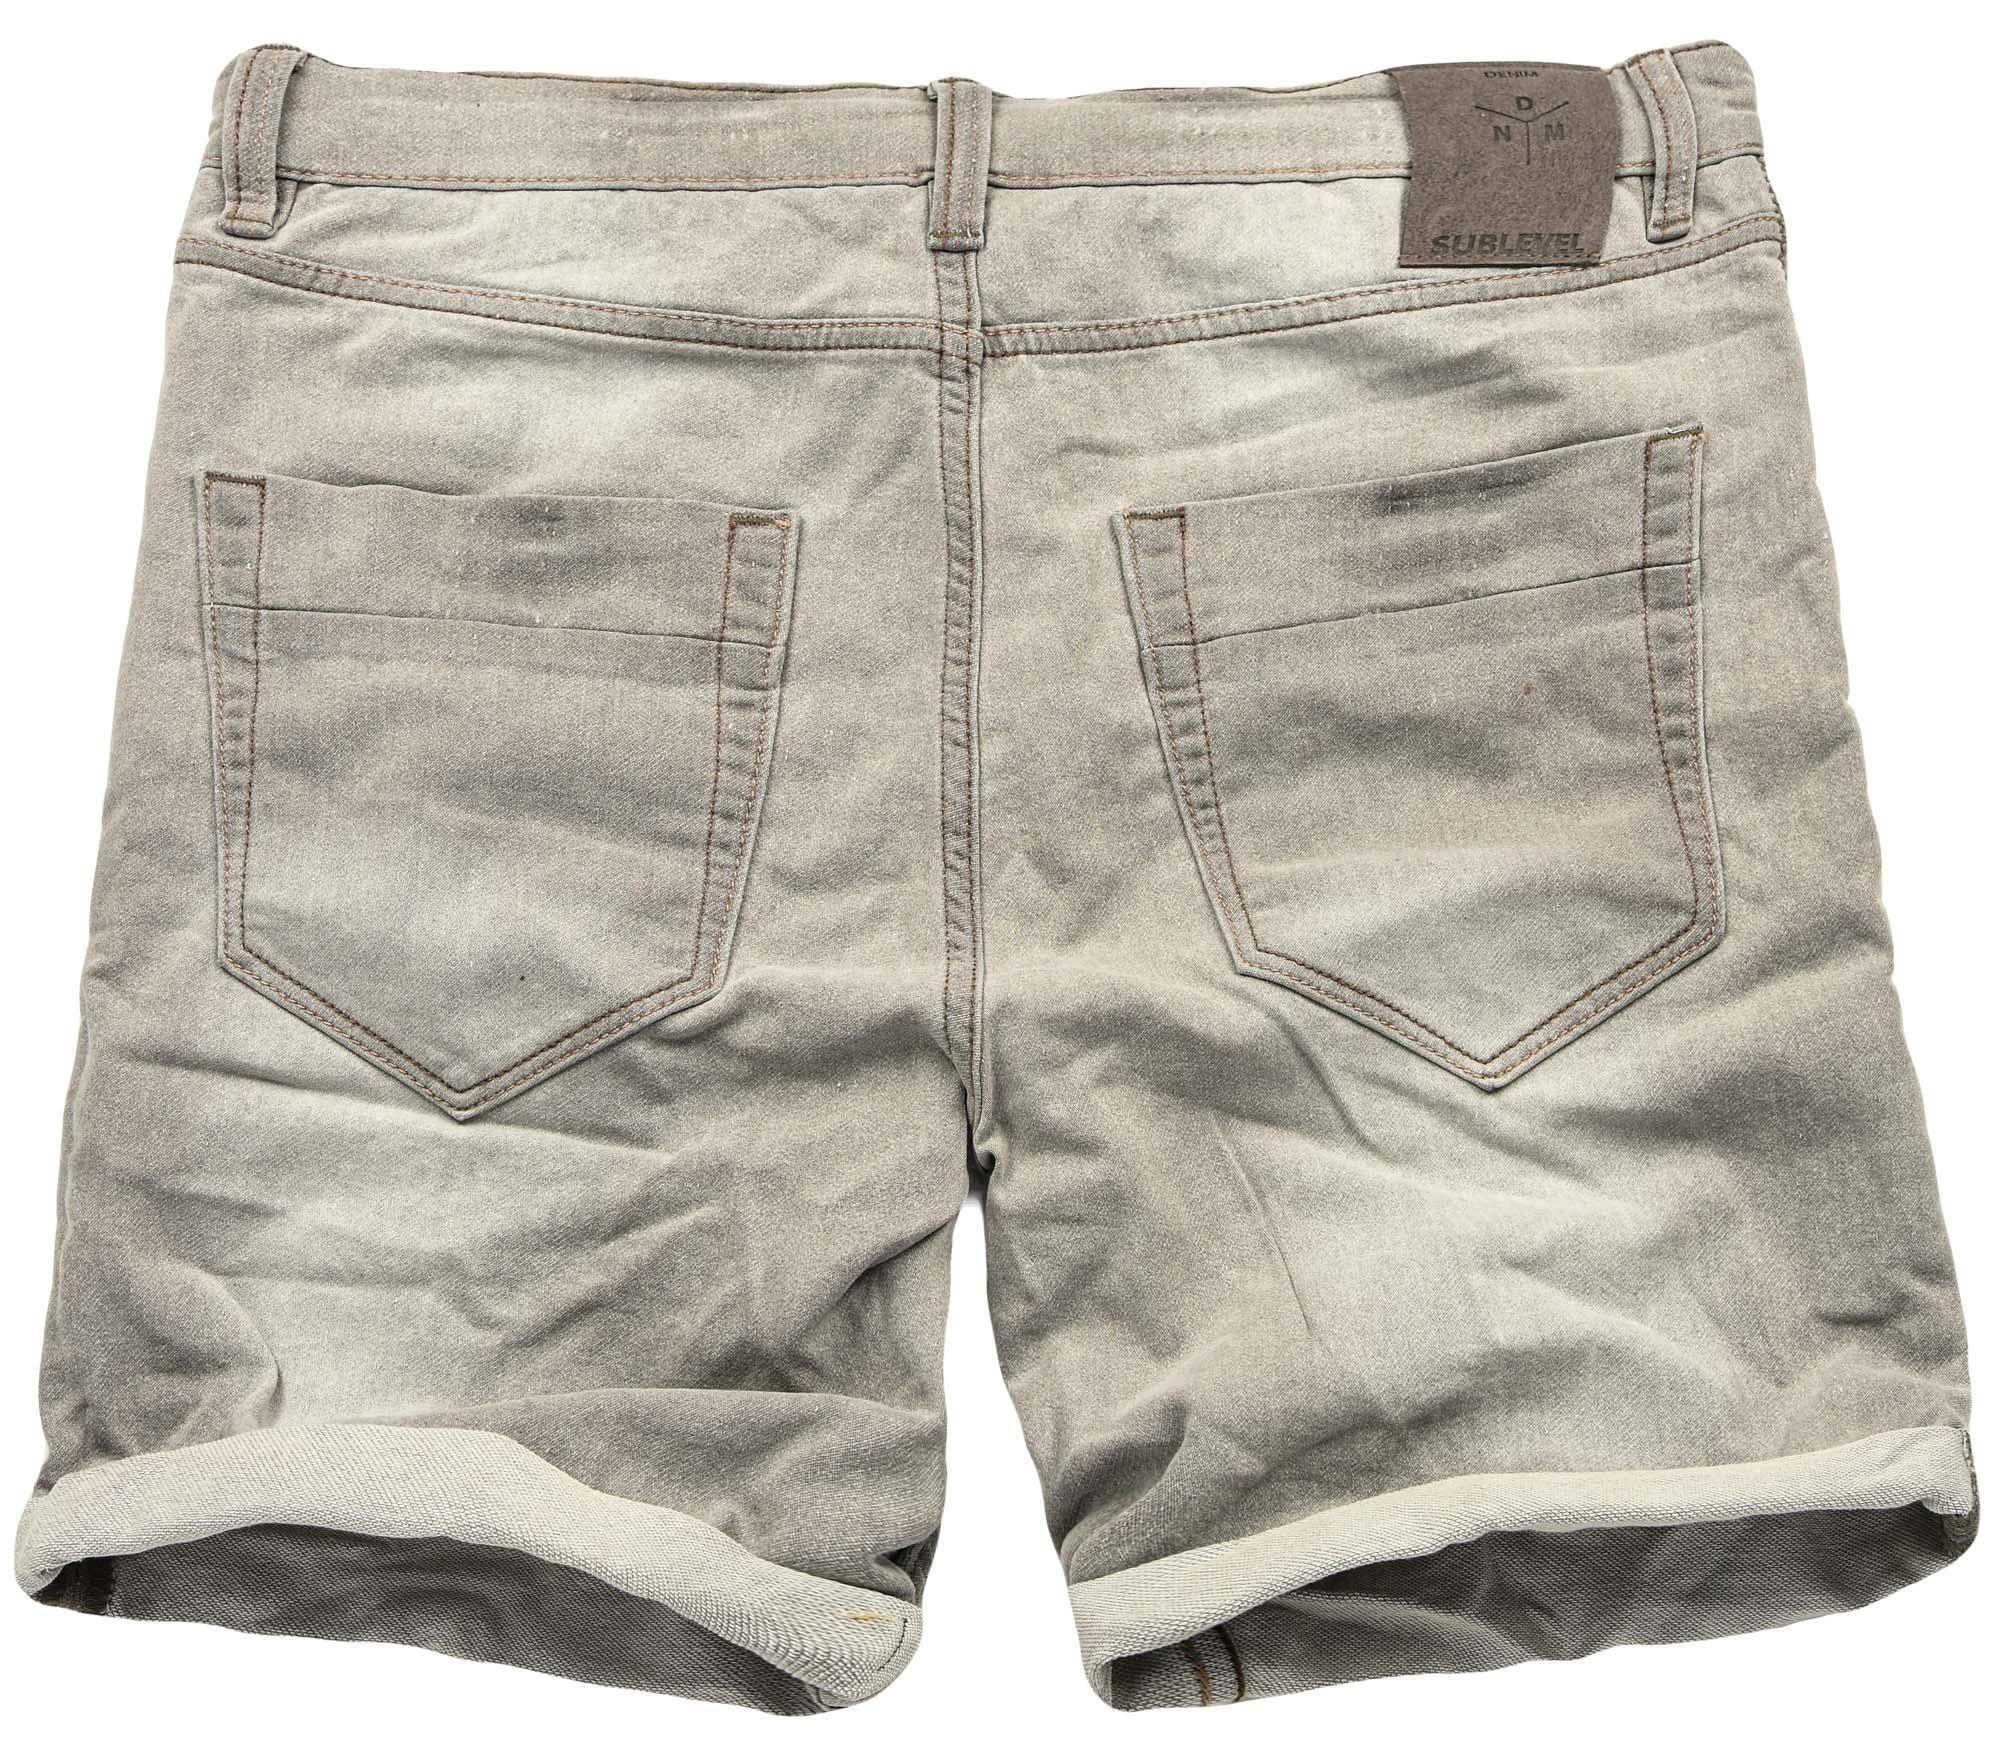 Sublevel-Herren-Sweat-Jeans-Shorts-kurze-Hose-Bermuda-Sommer-Sweathose-Slim-NEU Indexbild 21